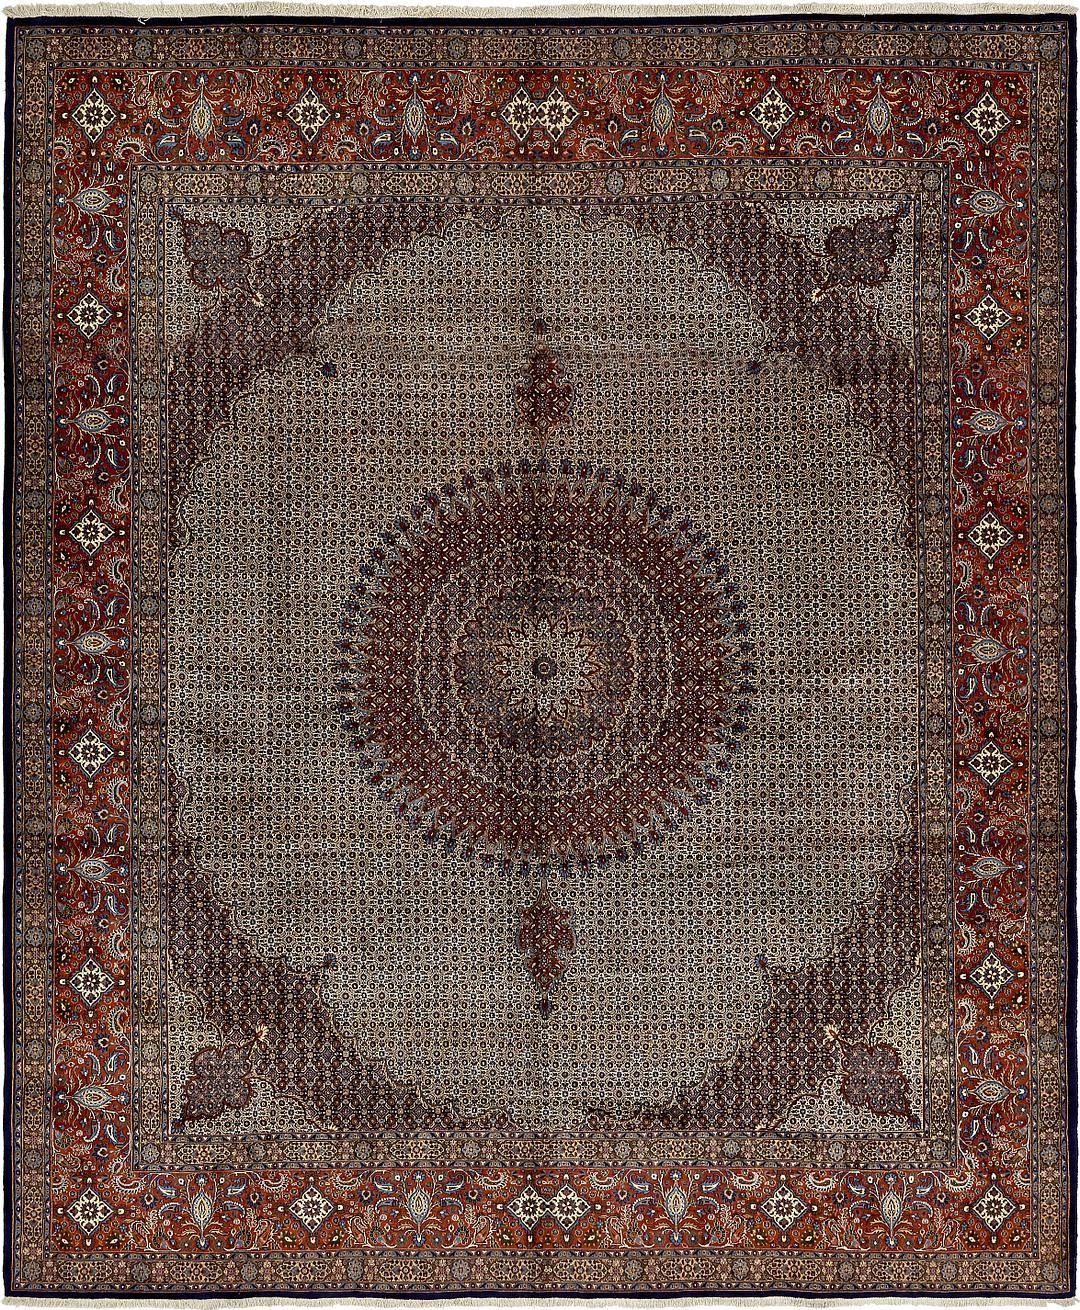 Beige 13 2 X 15 8 Mood Persian Rug Persian Rugs Esalerugs Rugs Persian Rug Persian